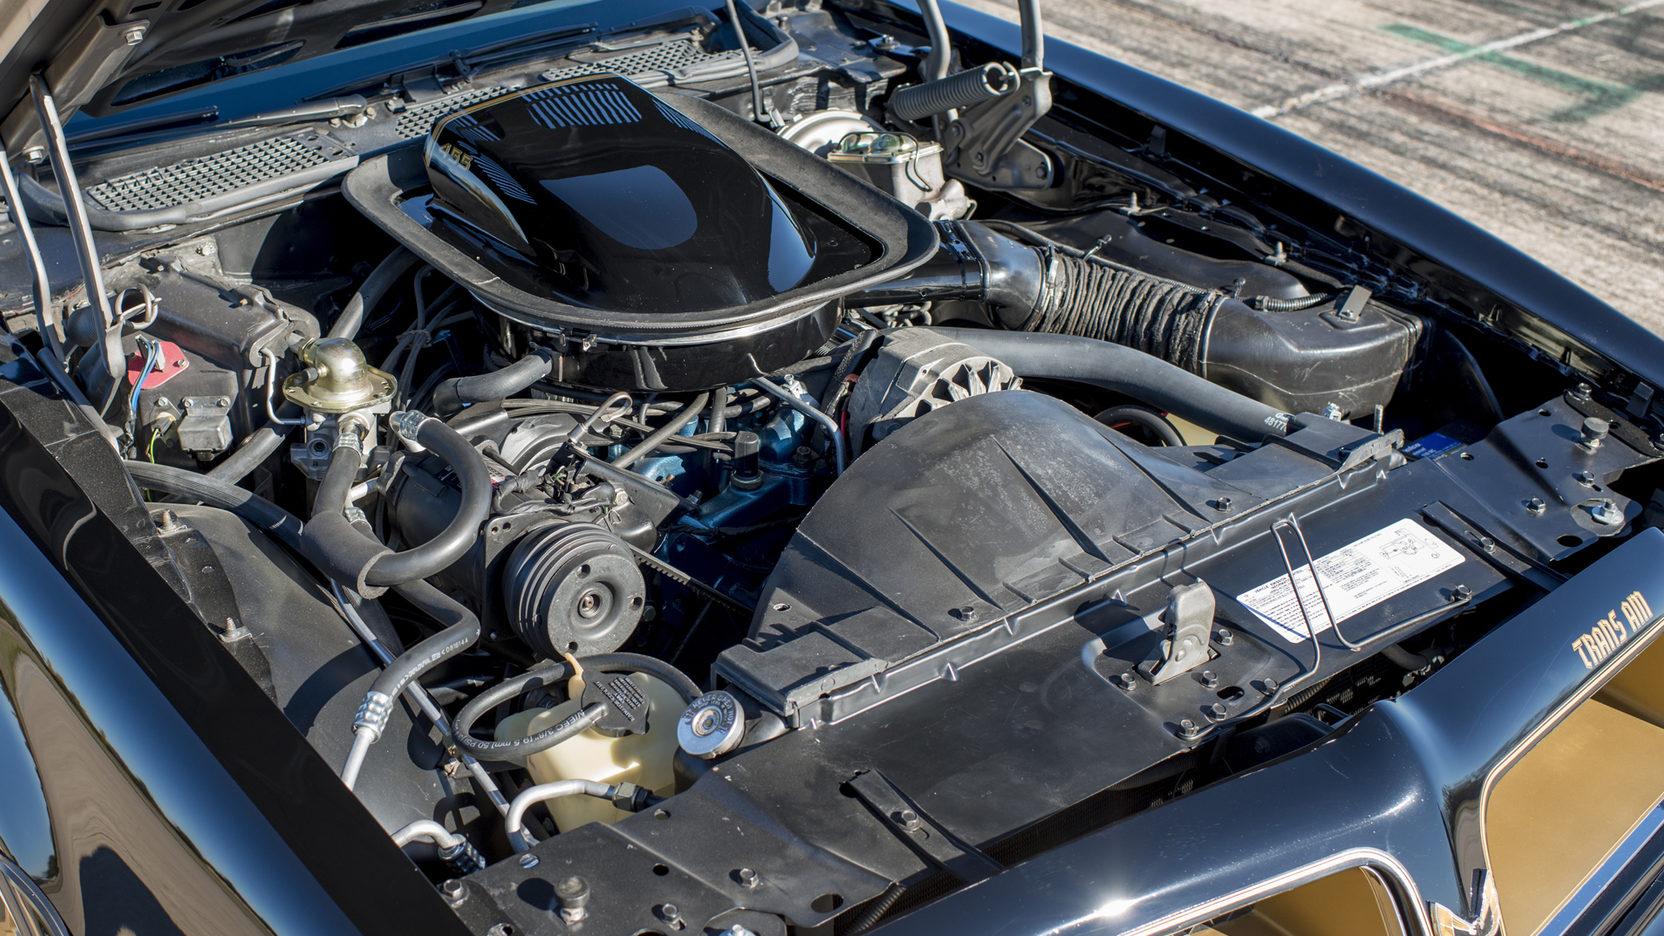 1976 Pontiac Firebird Trans Am engine passenger side